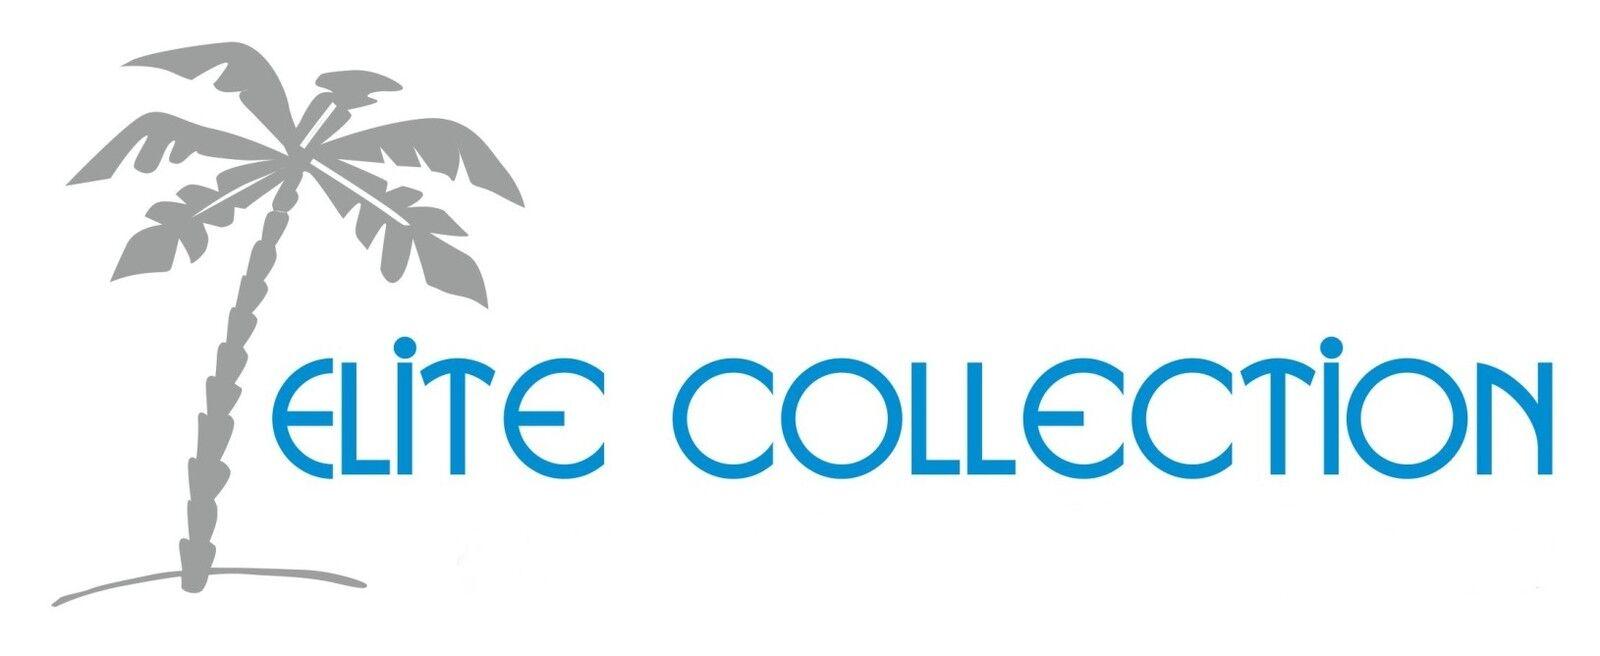 ec-elite-collection